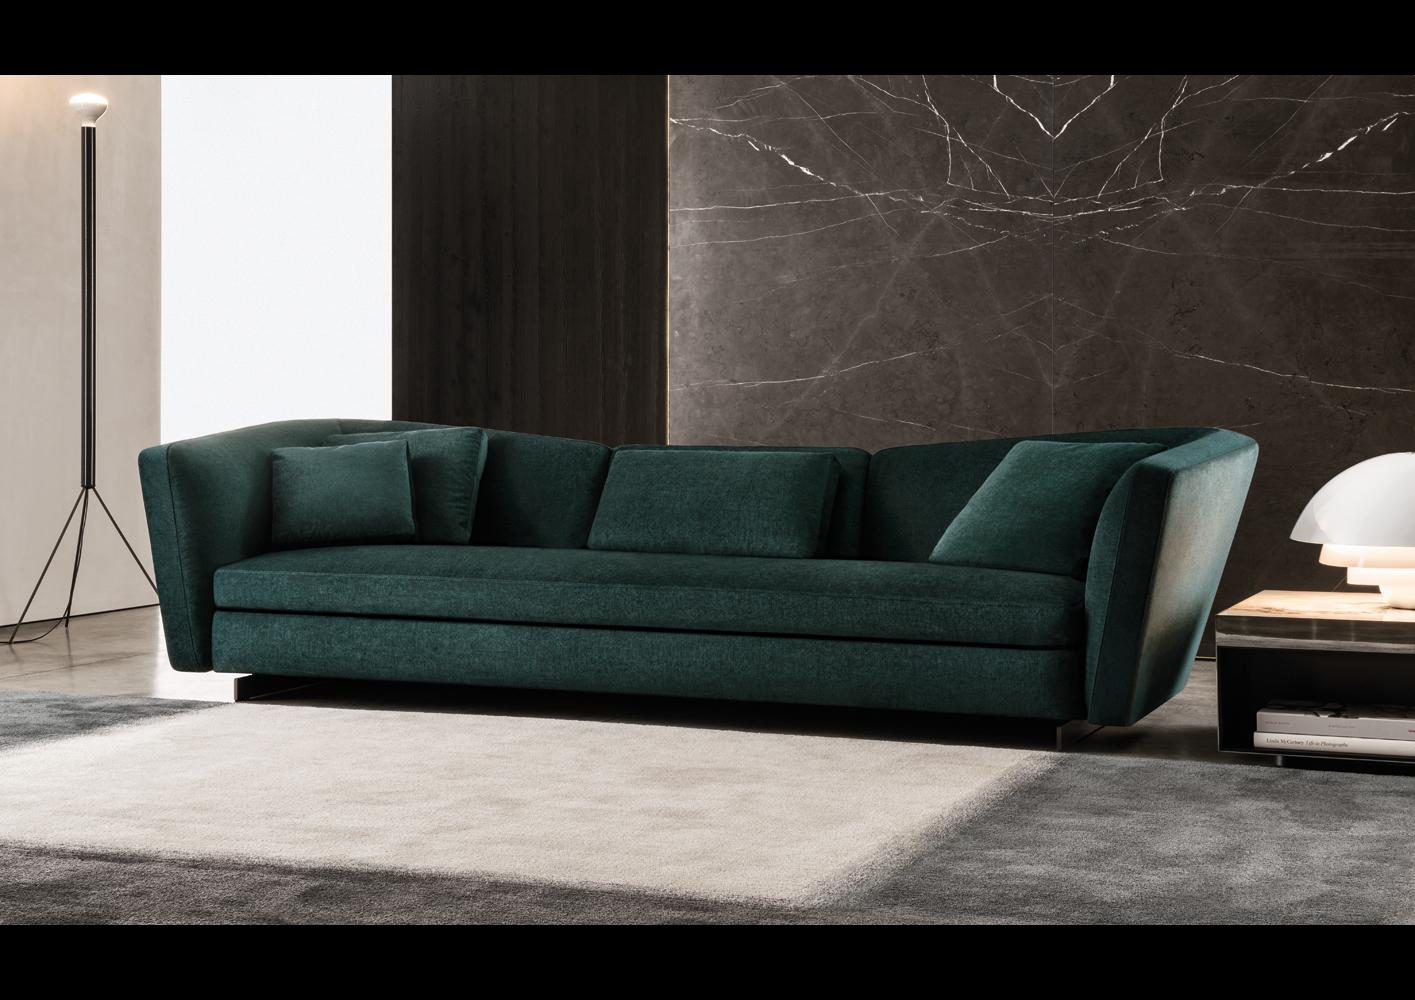 material and leather sofa serta upholstery regular sleeper seymour | designed by rodolfo dordoni, minotti ...